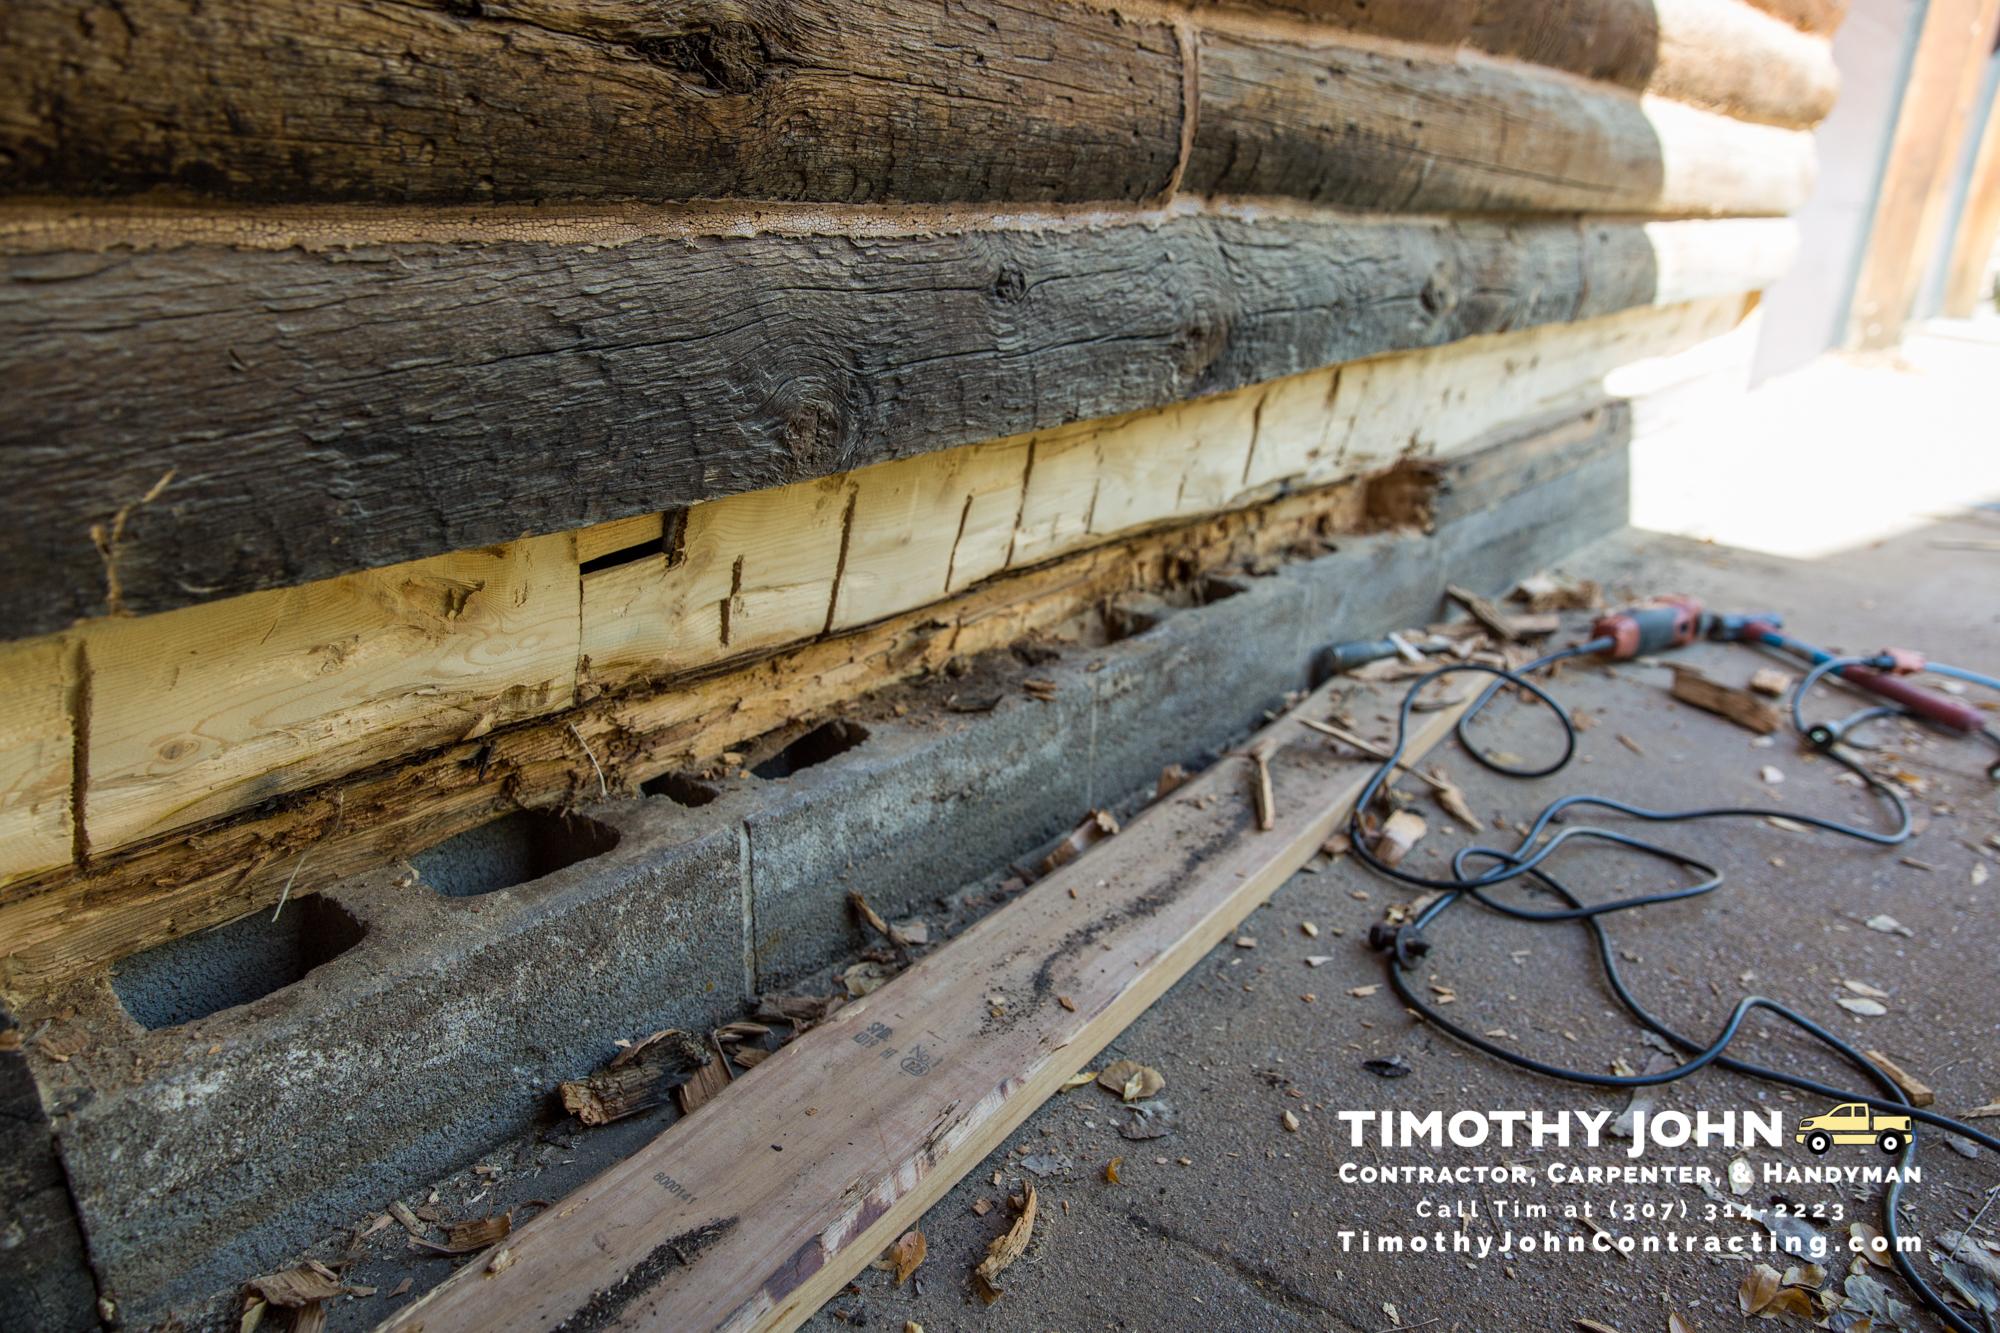 Timothy-John-Log-Restoration-Centennial-Laramie-Wyoming-Seneca-Creek-Studios-180926-SCS16437-8.jpg